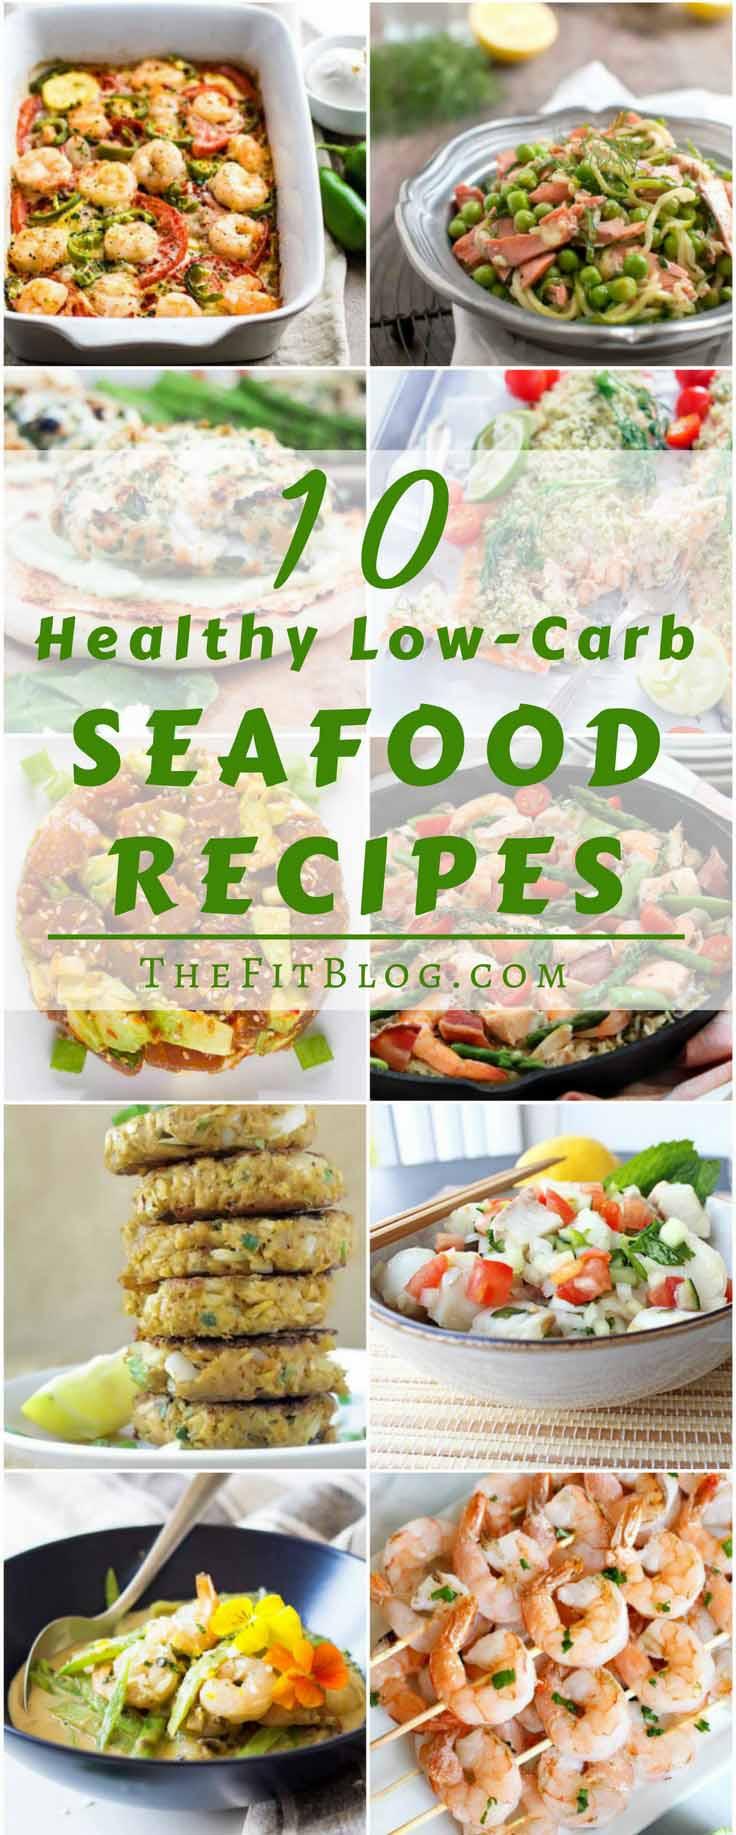 Healthy Shrimp Recipes Low Carb  10 Healthy Low Carb Seafood Recipes